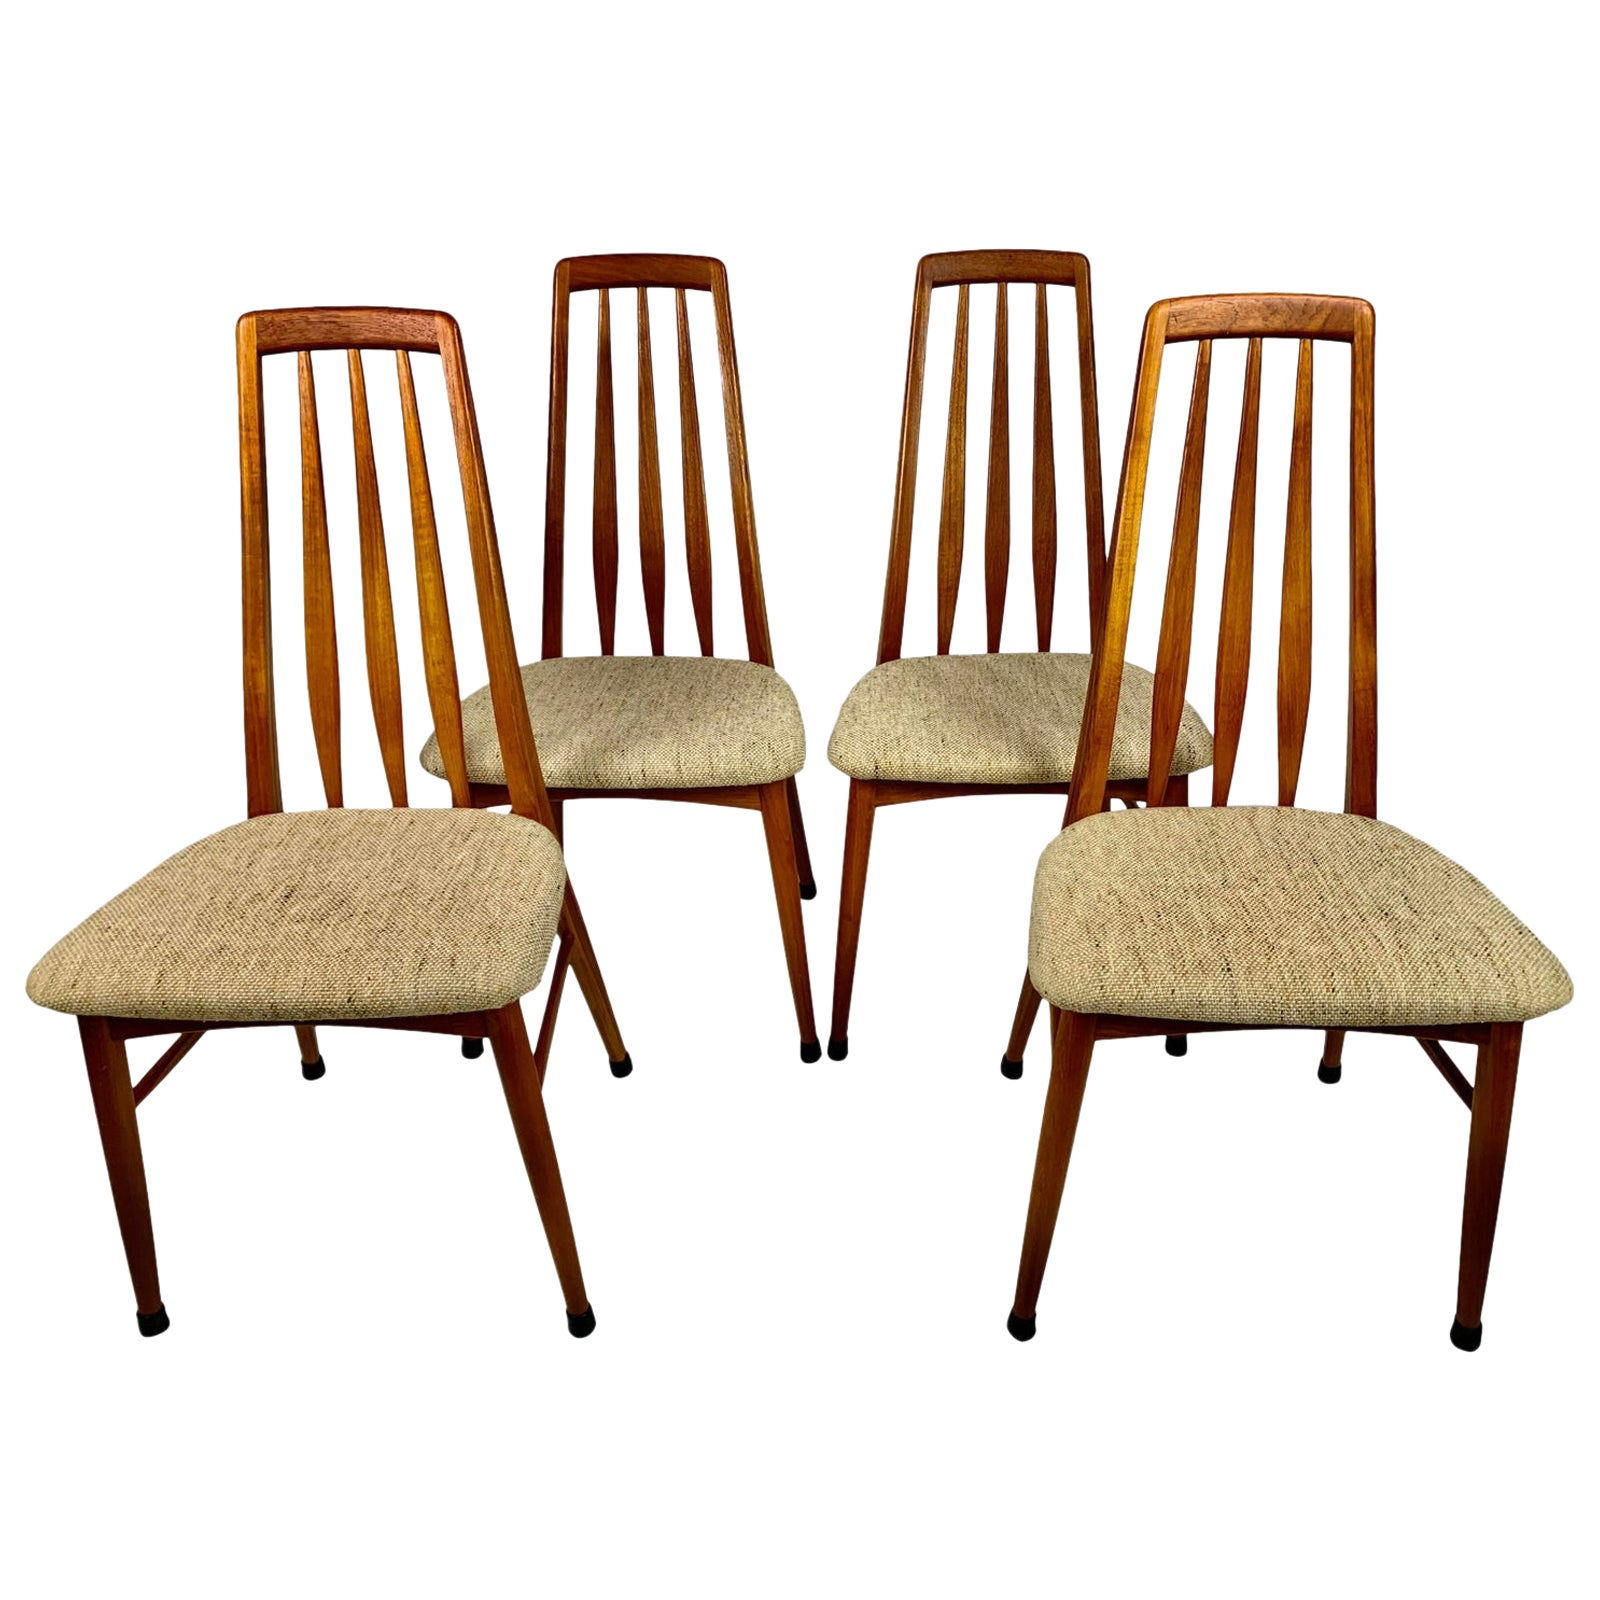 Midcentury Danish Teak Koefoeds Hornslet 'Eva' Chairs, Set of 4